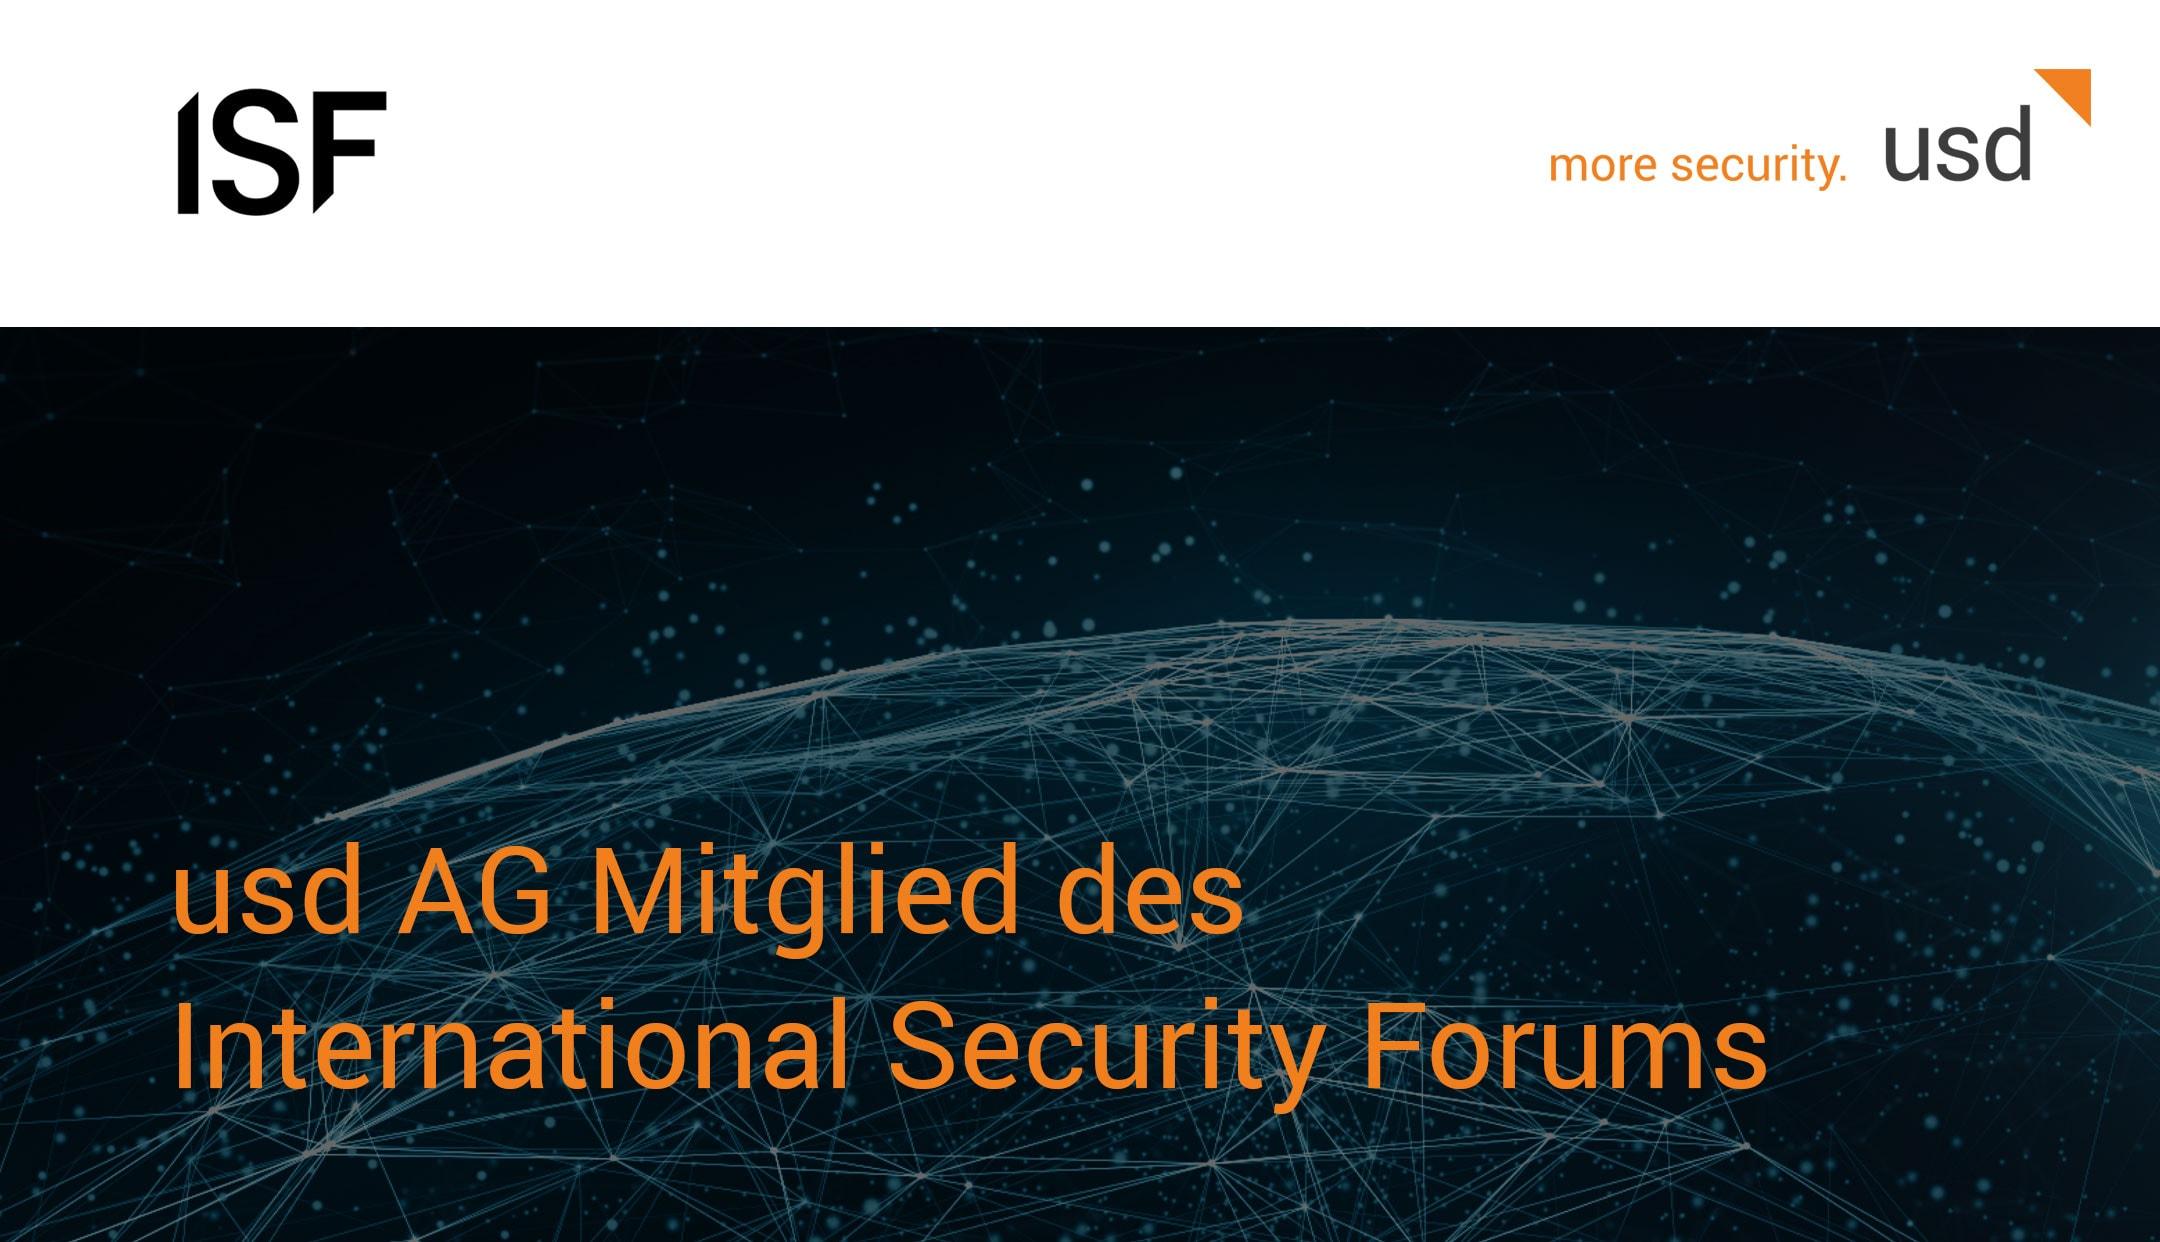 usd AG Mitglied des International Security Forums